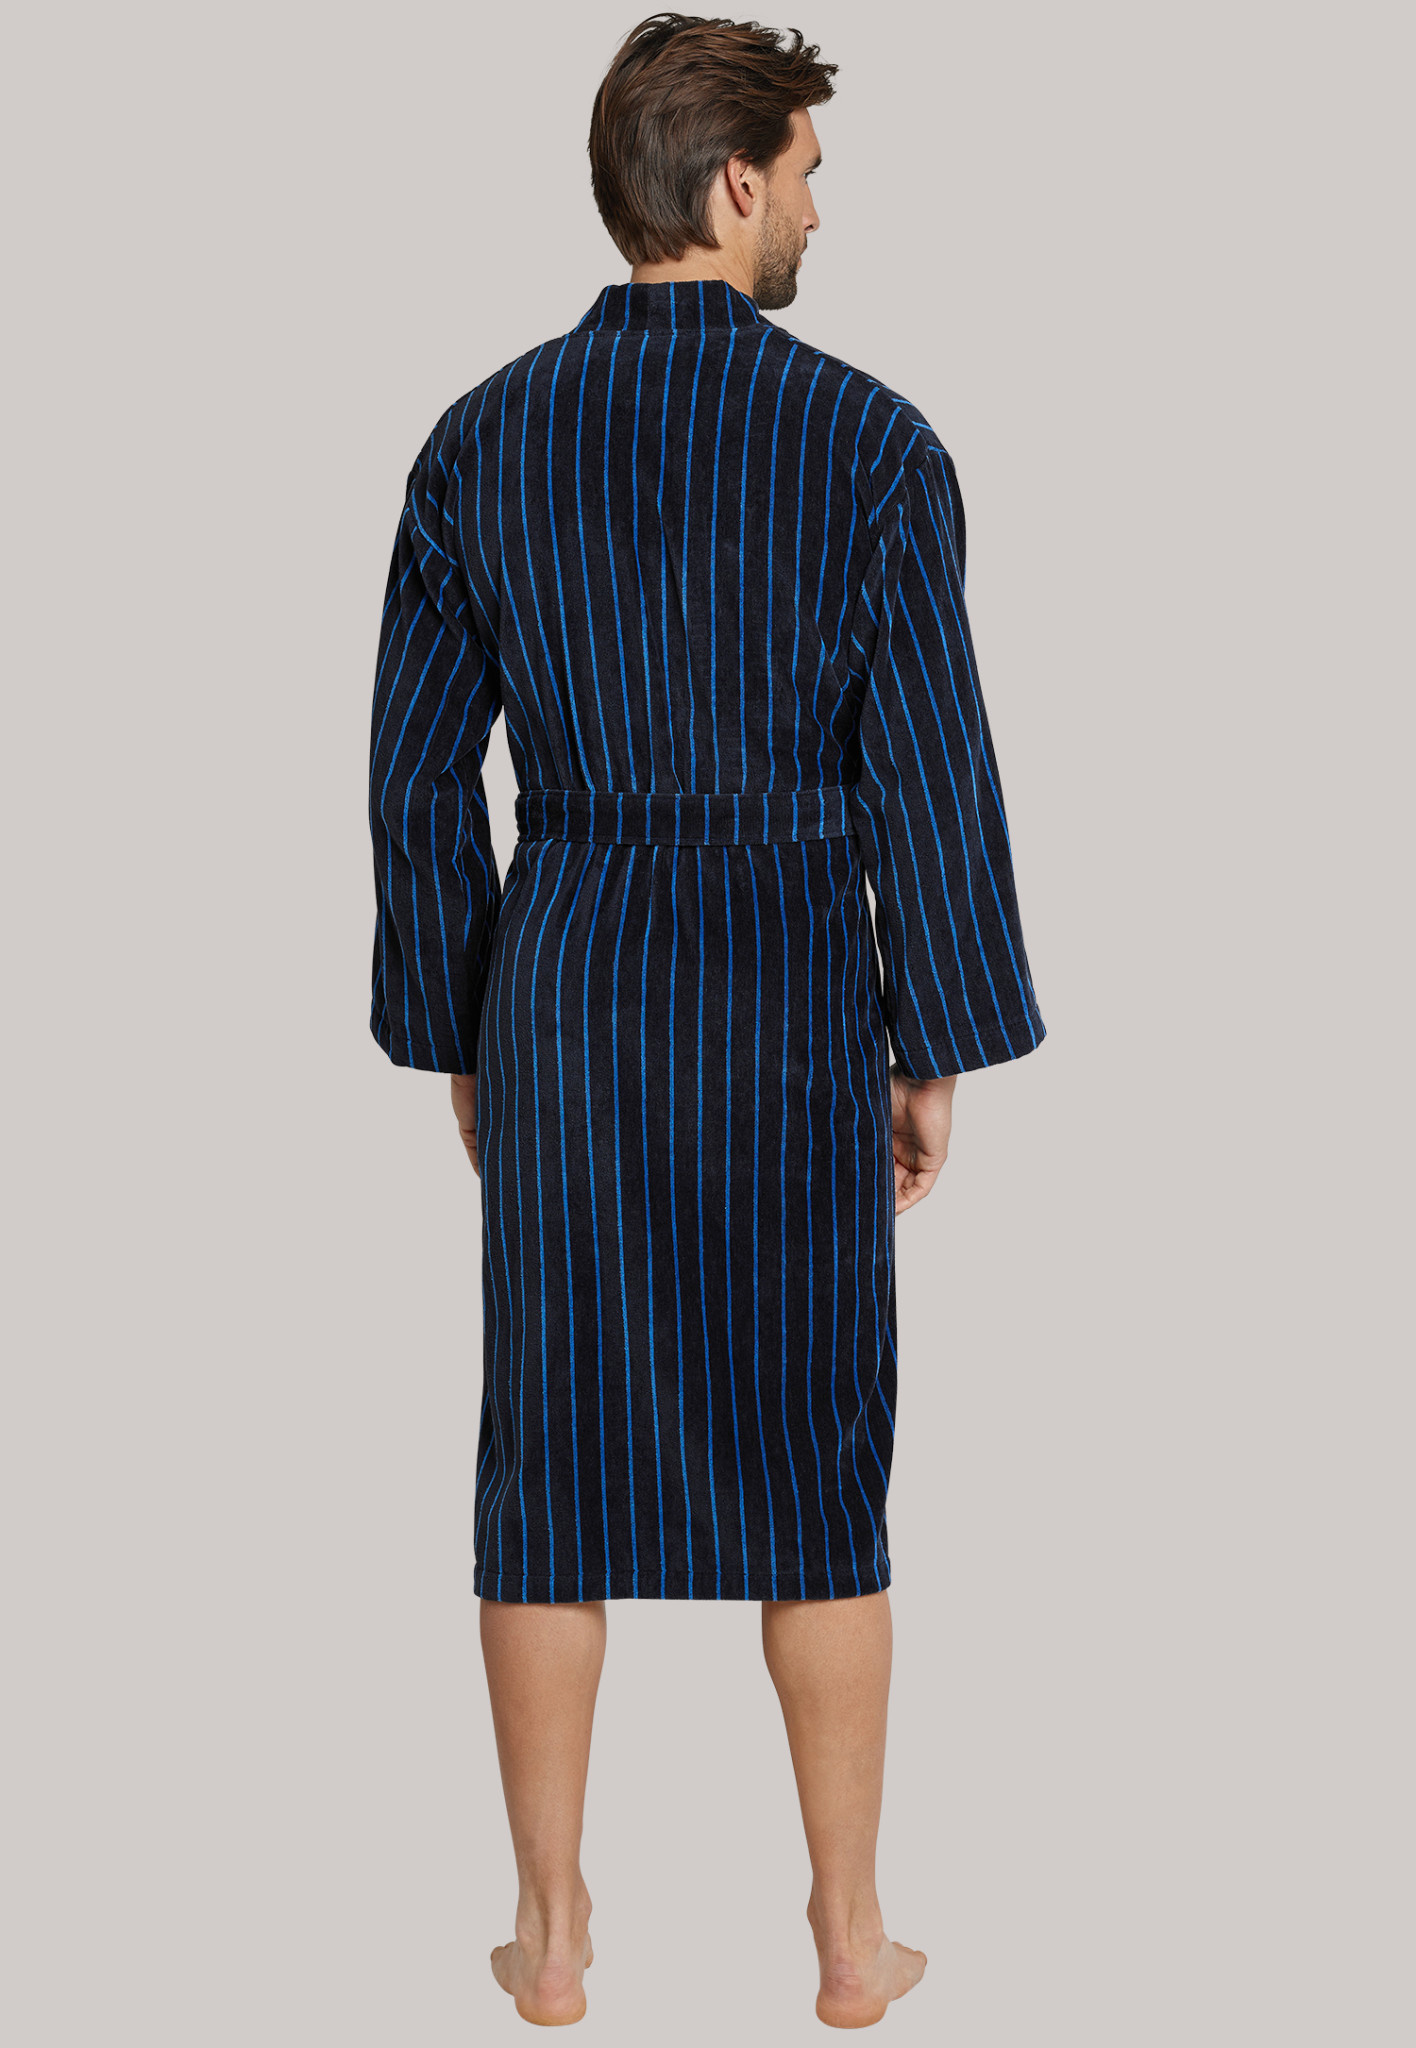 Badjas 142106 - donkerblauw-2